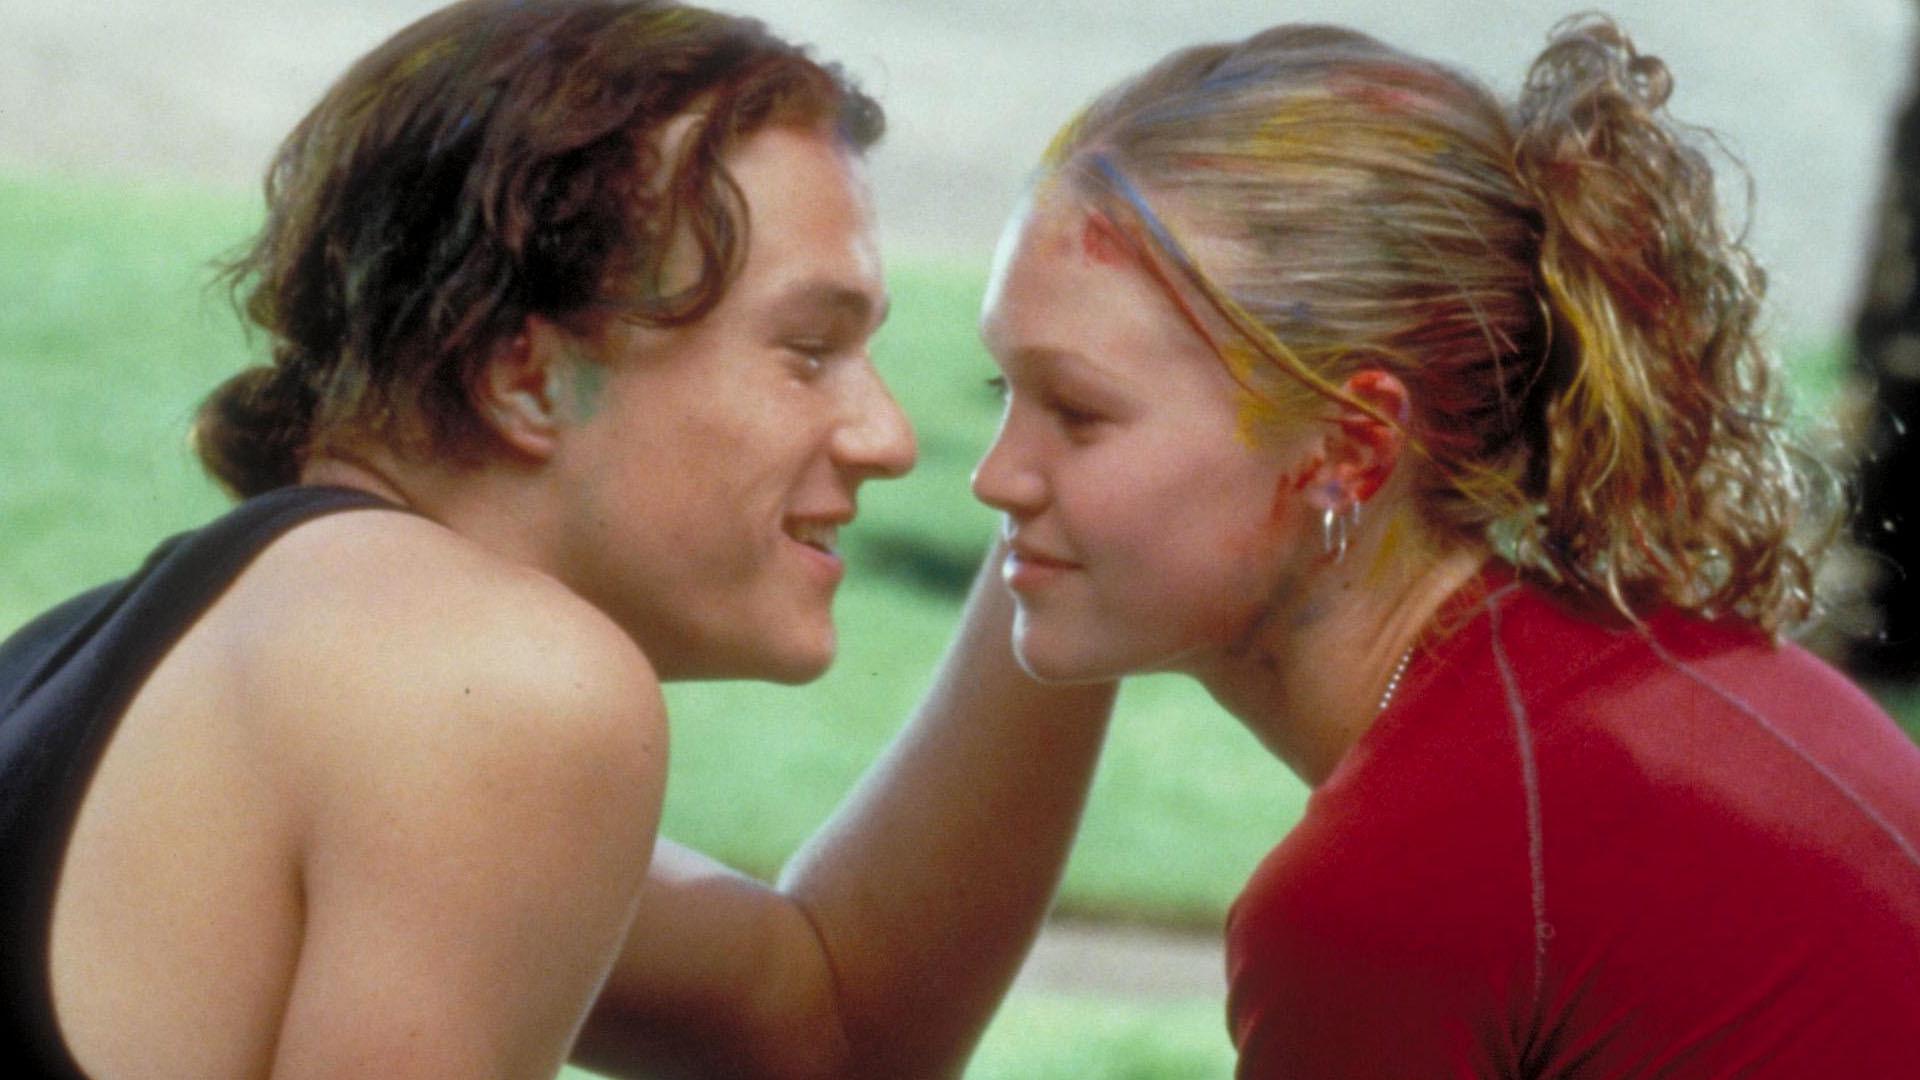 10thingsihateaboutyou Heathledger Juliastiles: Especial San Valentin – 10 Grandes Parejas Del Cine